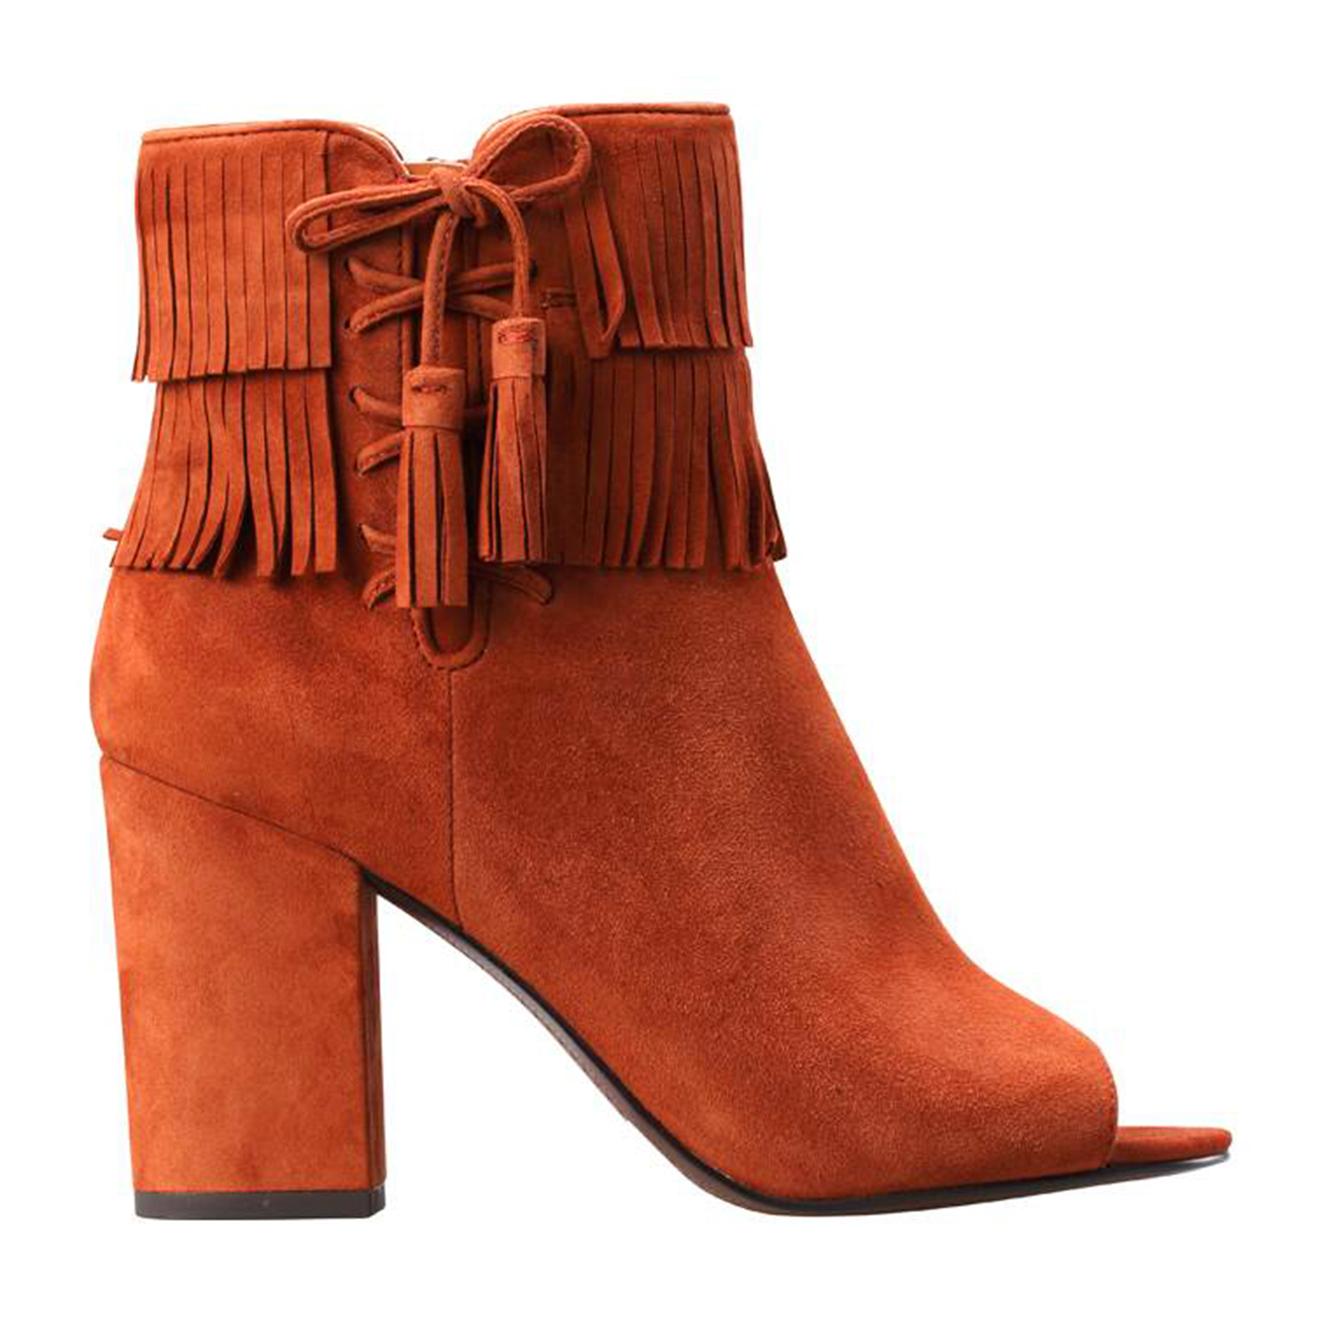 Bottines open-toe à frange en velours de Cuir camel Talon 8.5 cm - What For - Modalova